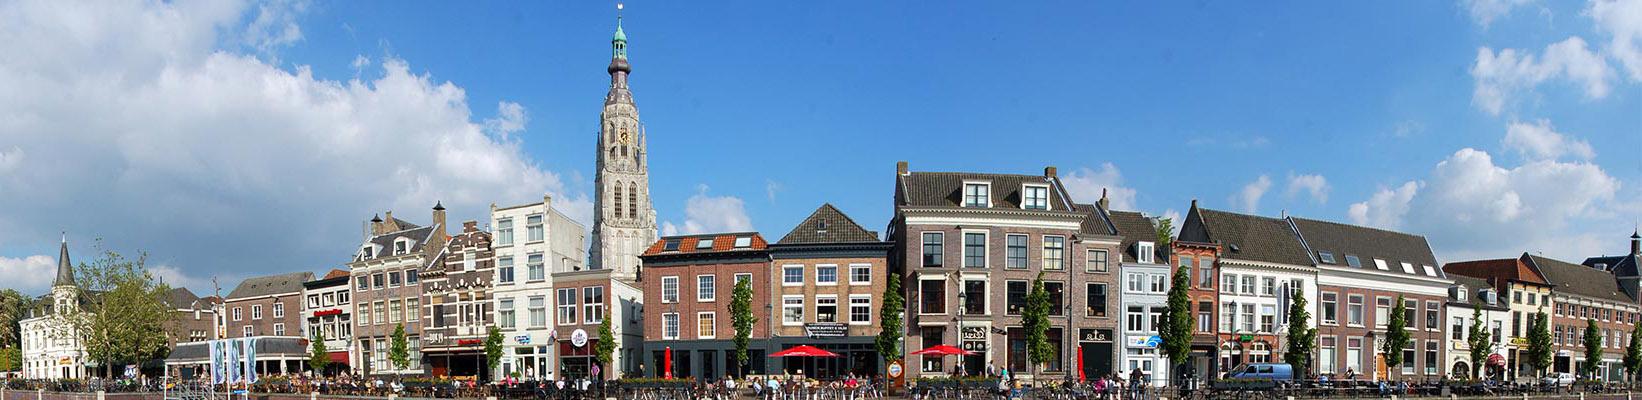 Breda, the location of Brickfund's first real estate investment portfolio